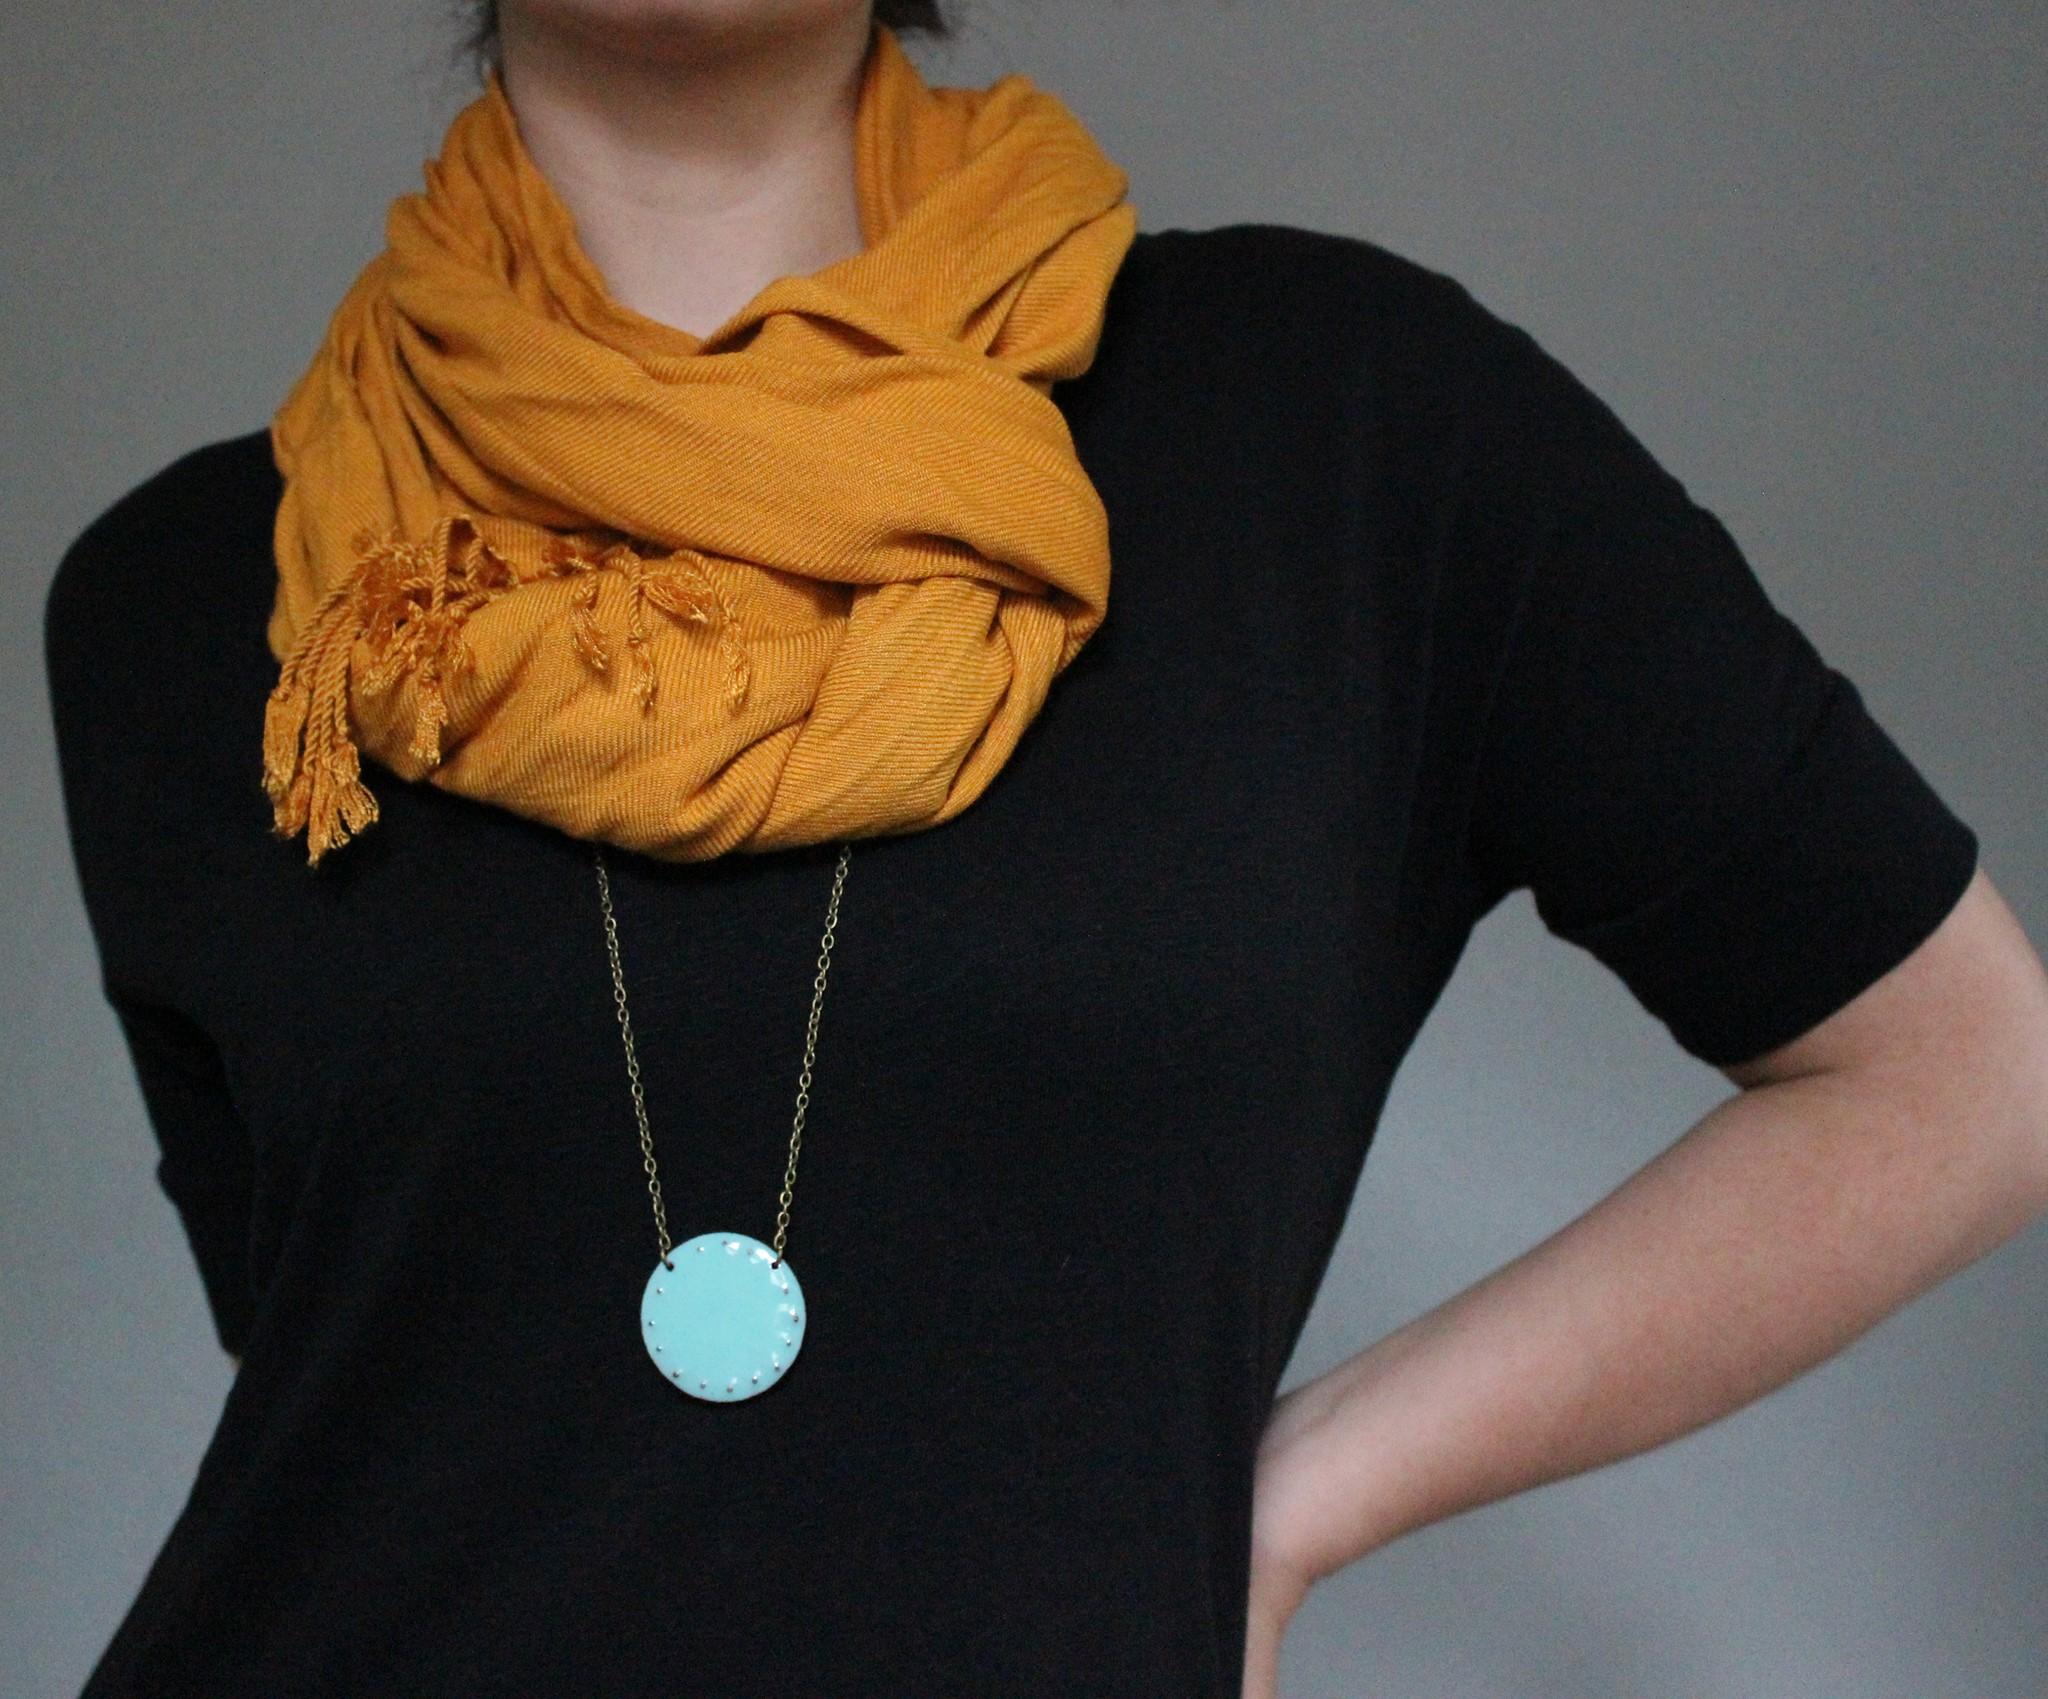 Turquoise Nomad Necklace.jpg